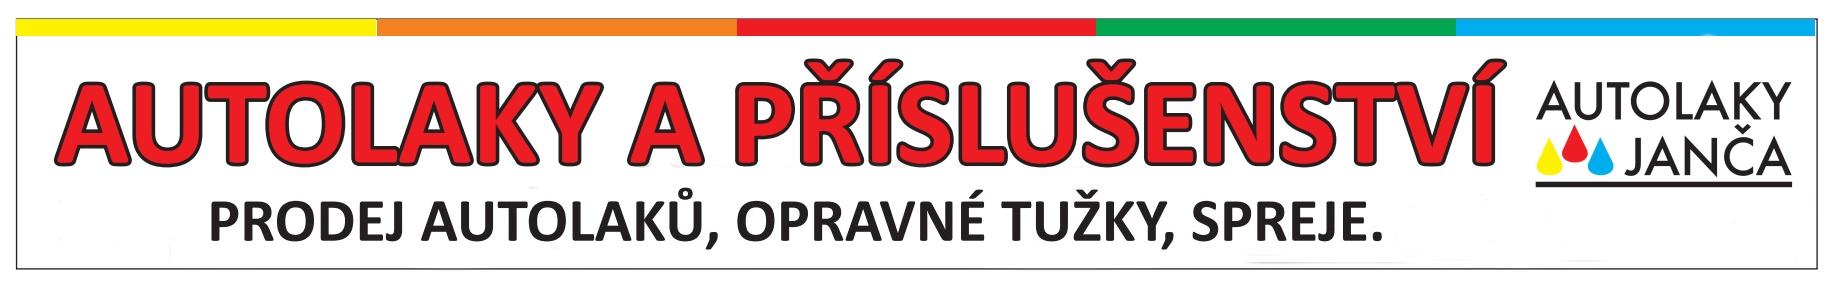 logo firmy Autolakovna, autolaky Janča